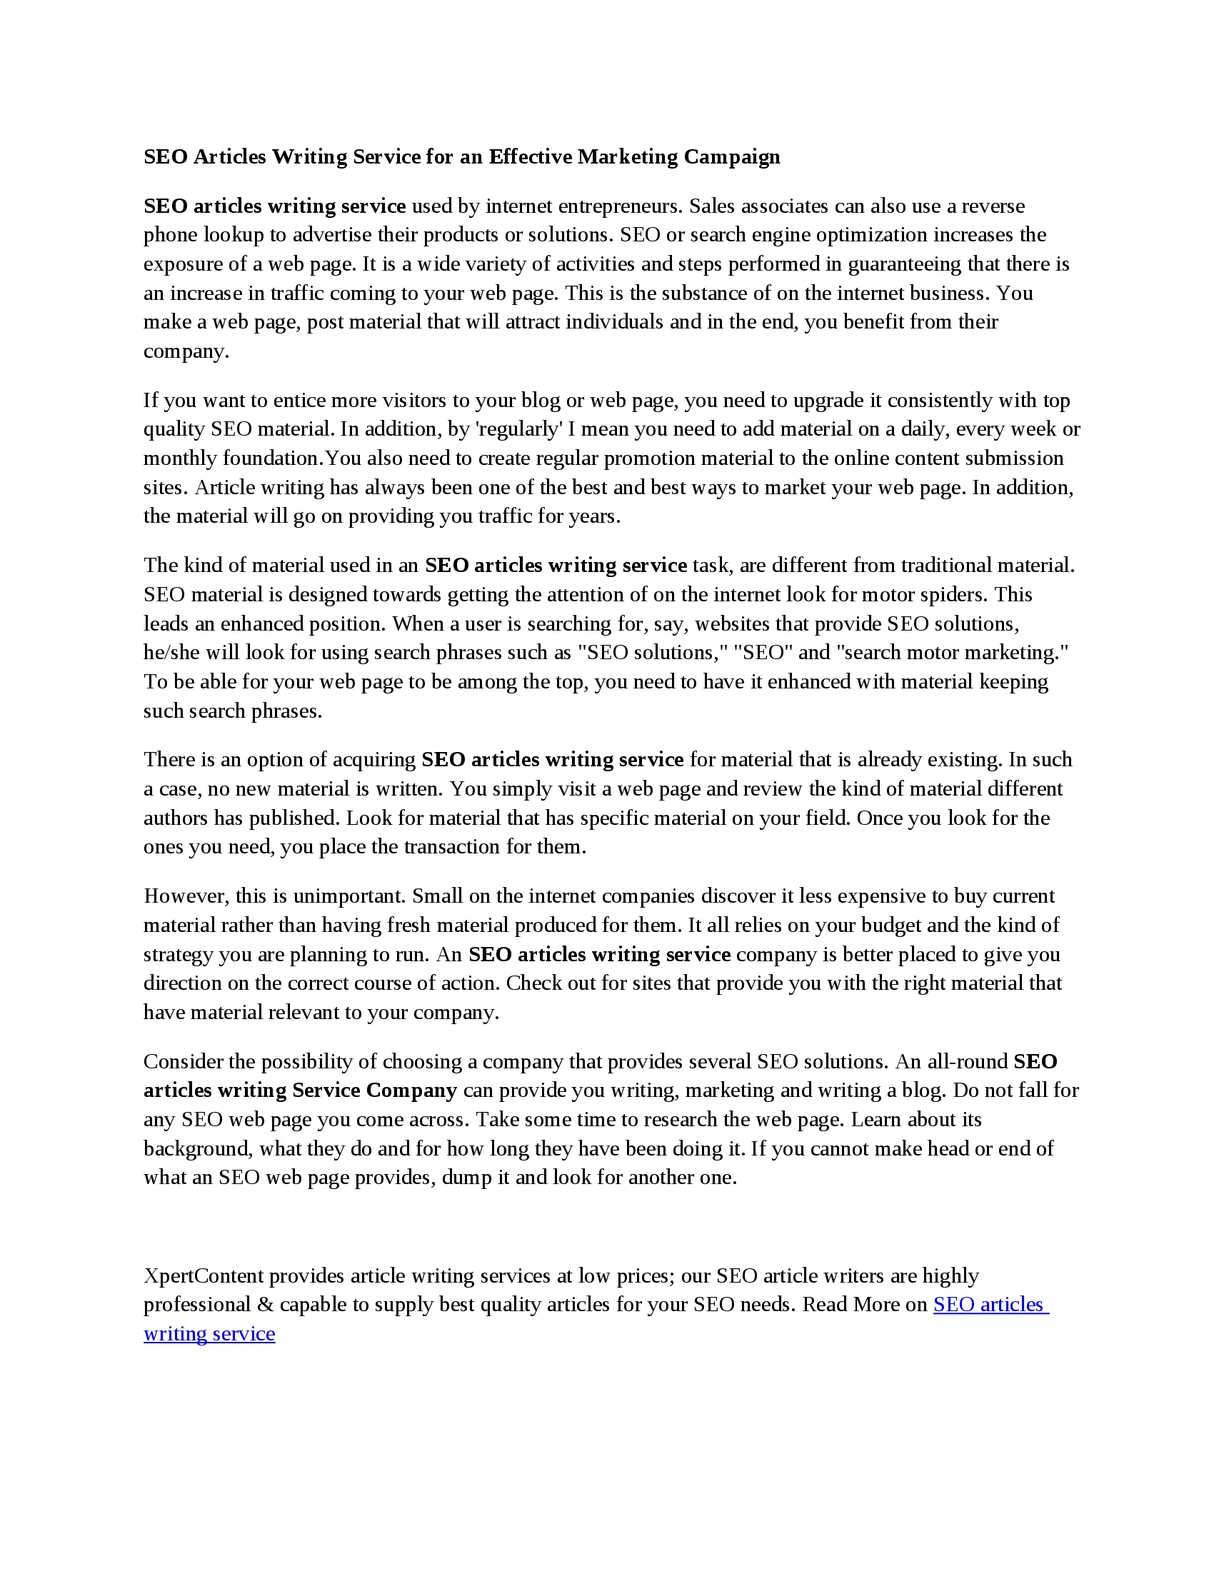 Calamo  Seo Articles Writing Service